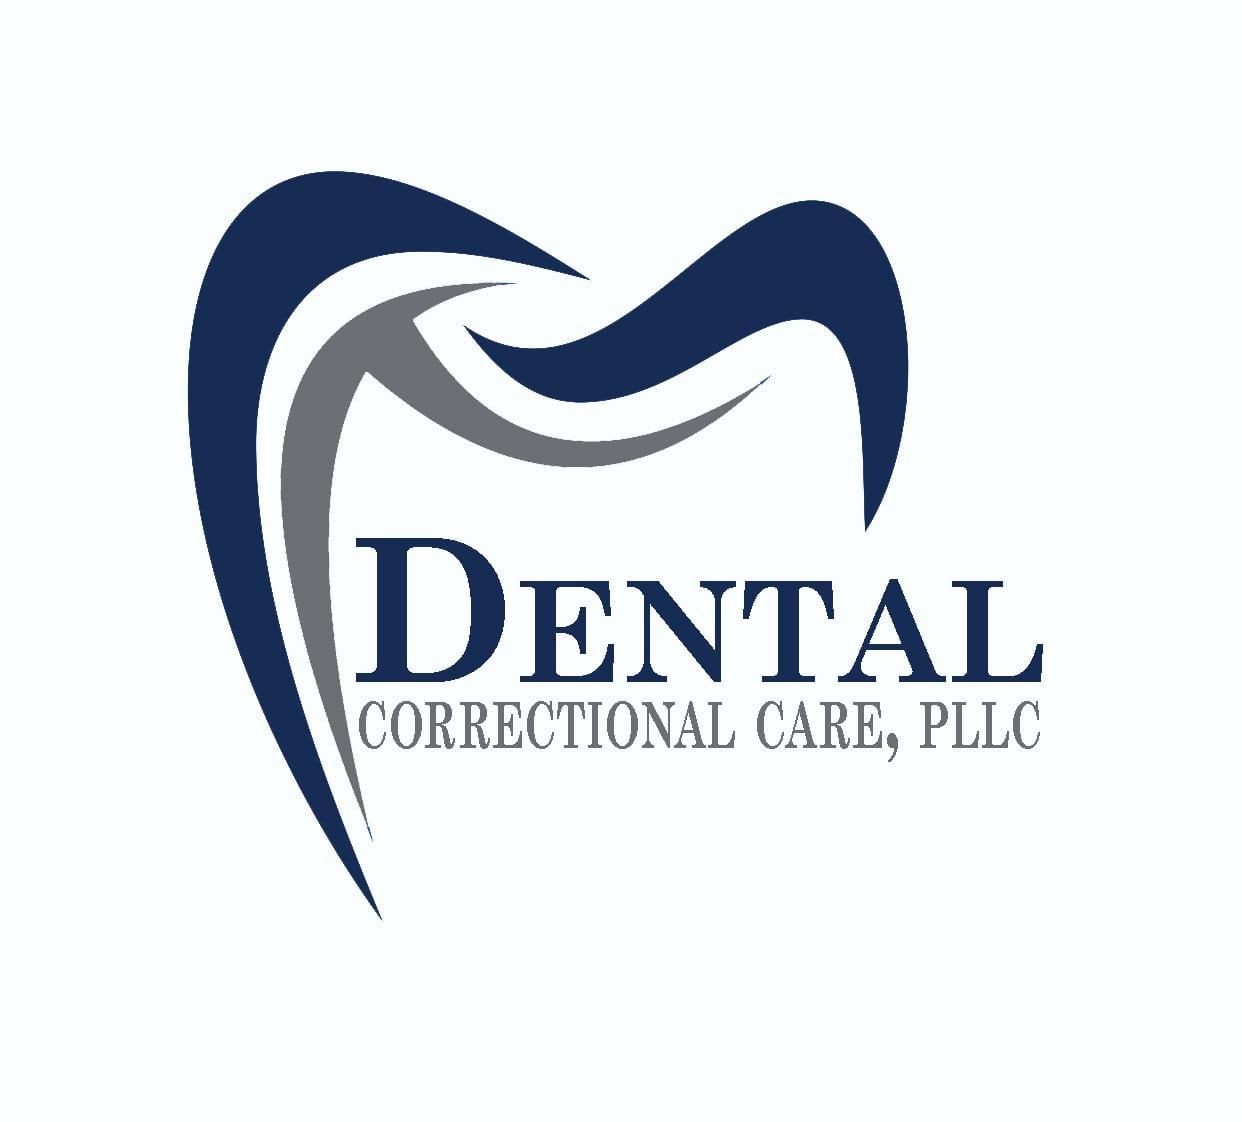 Dental-Correctional-Care